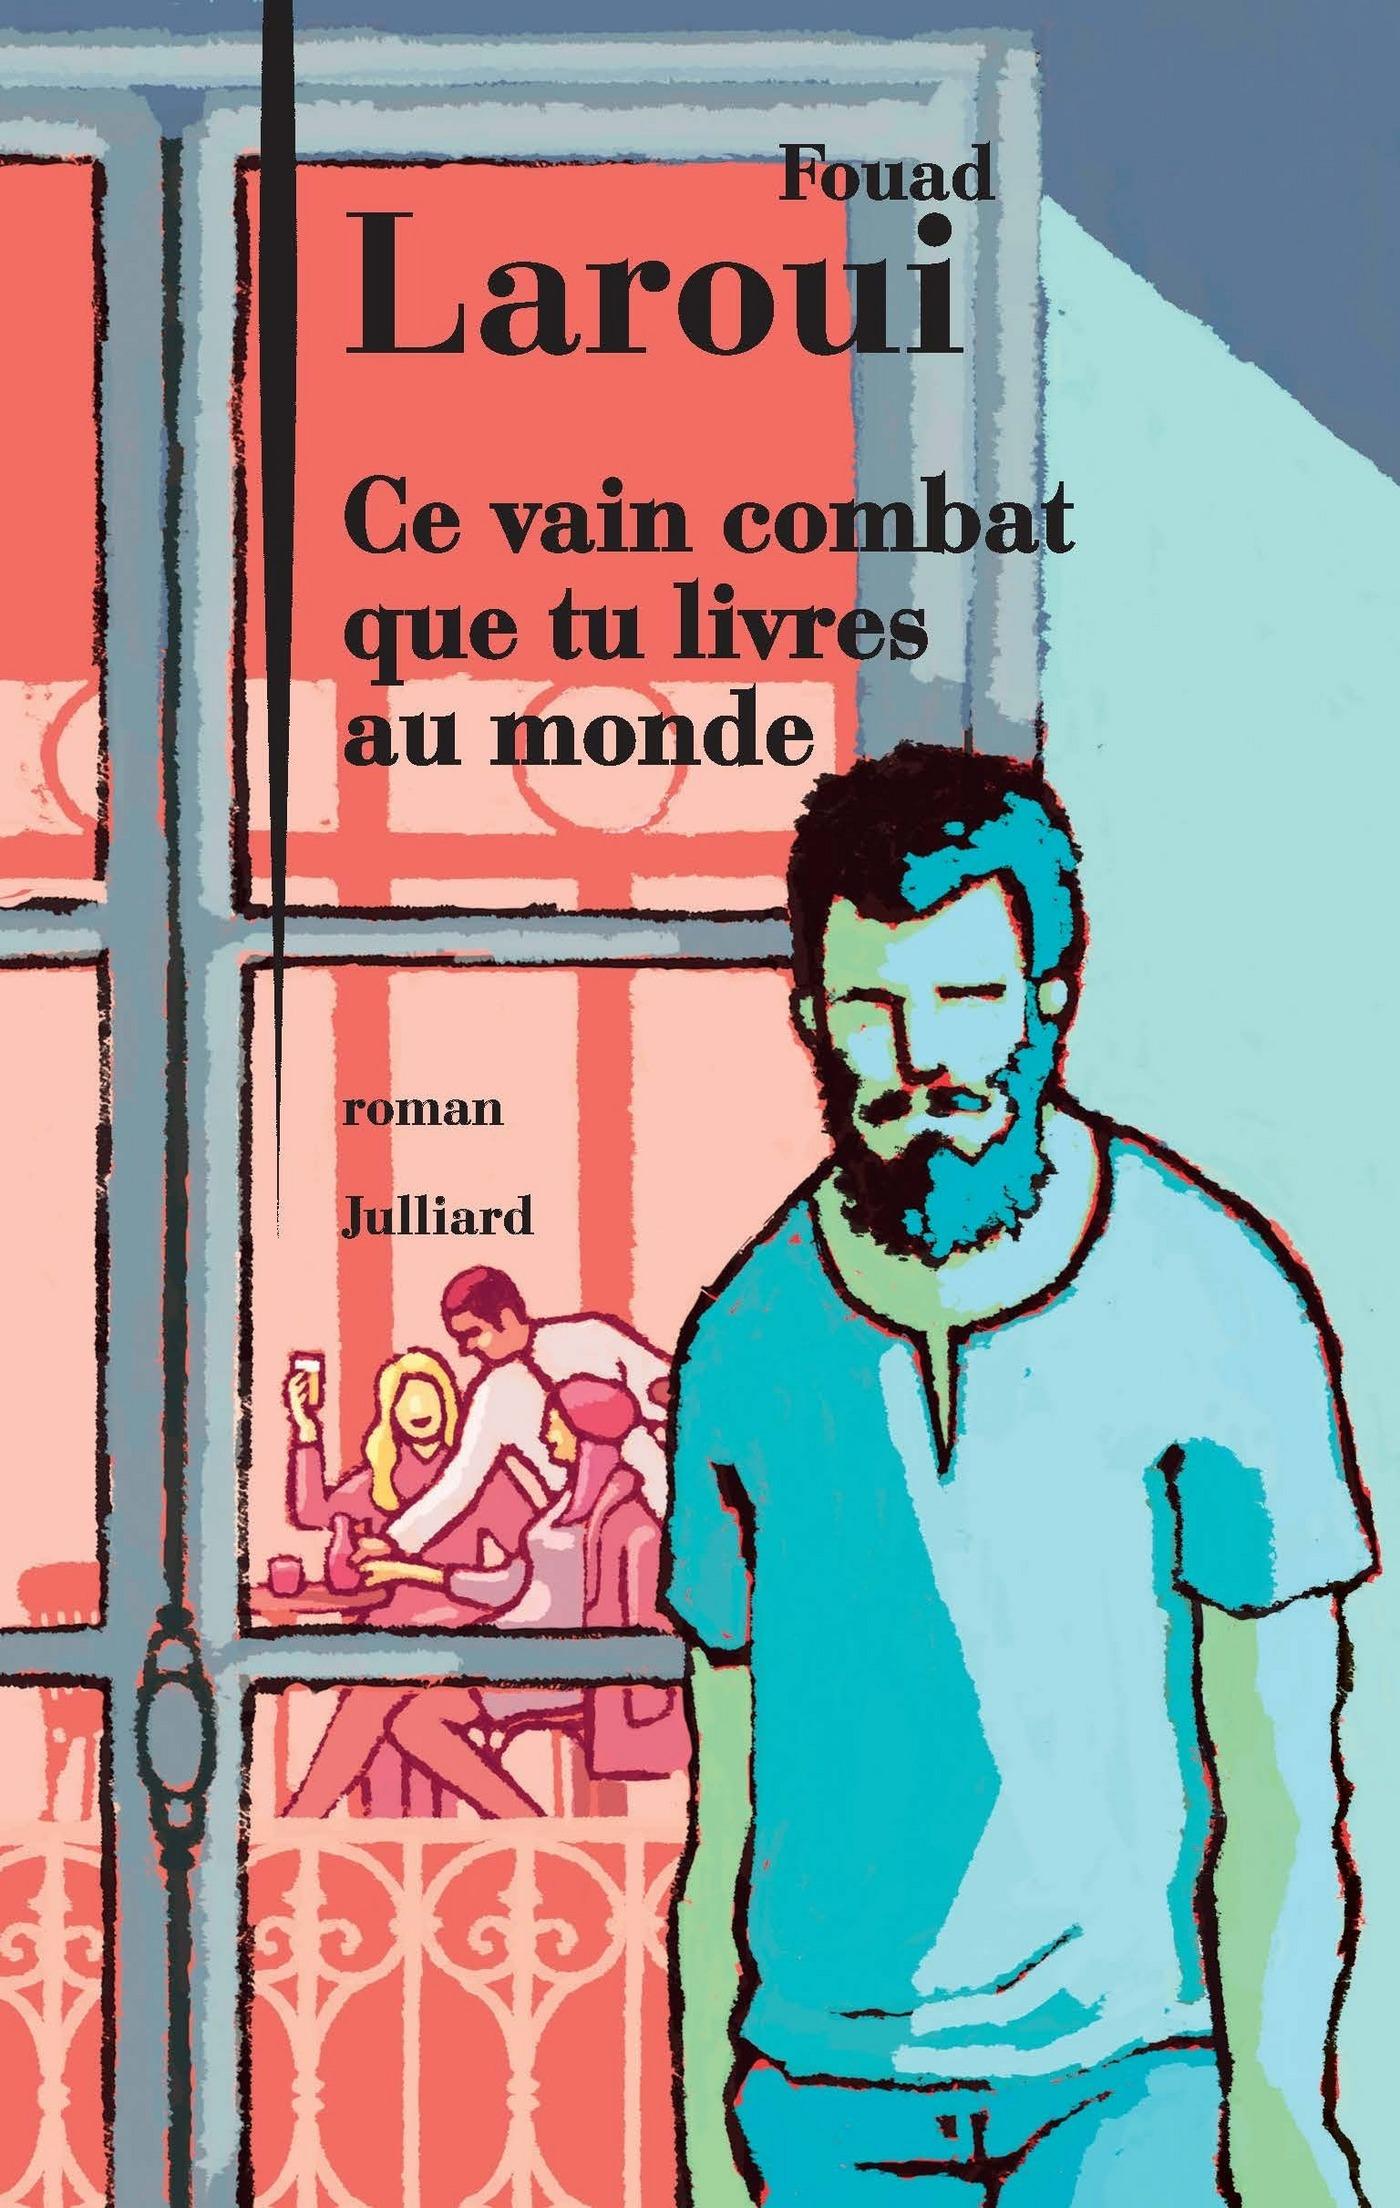 Ce vain combat que tu livres au monde | LAROUI, Fouad